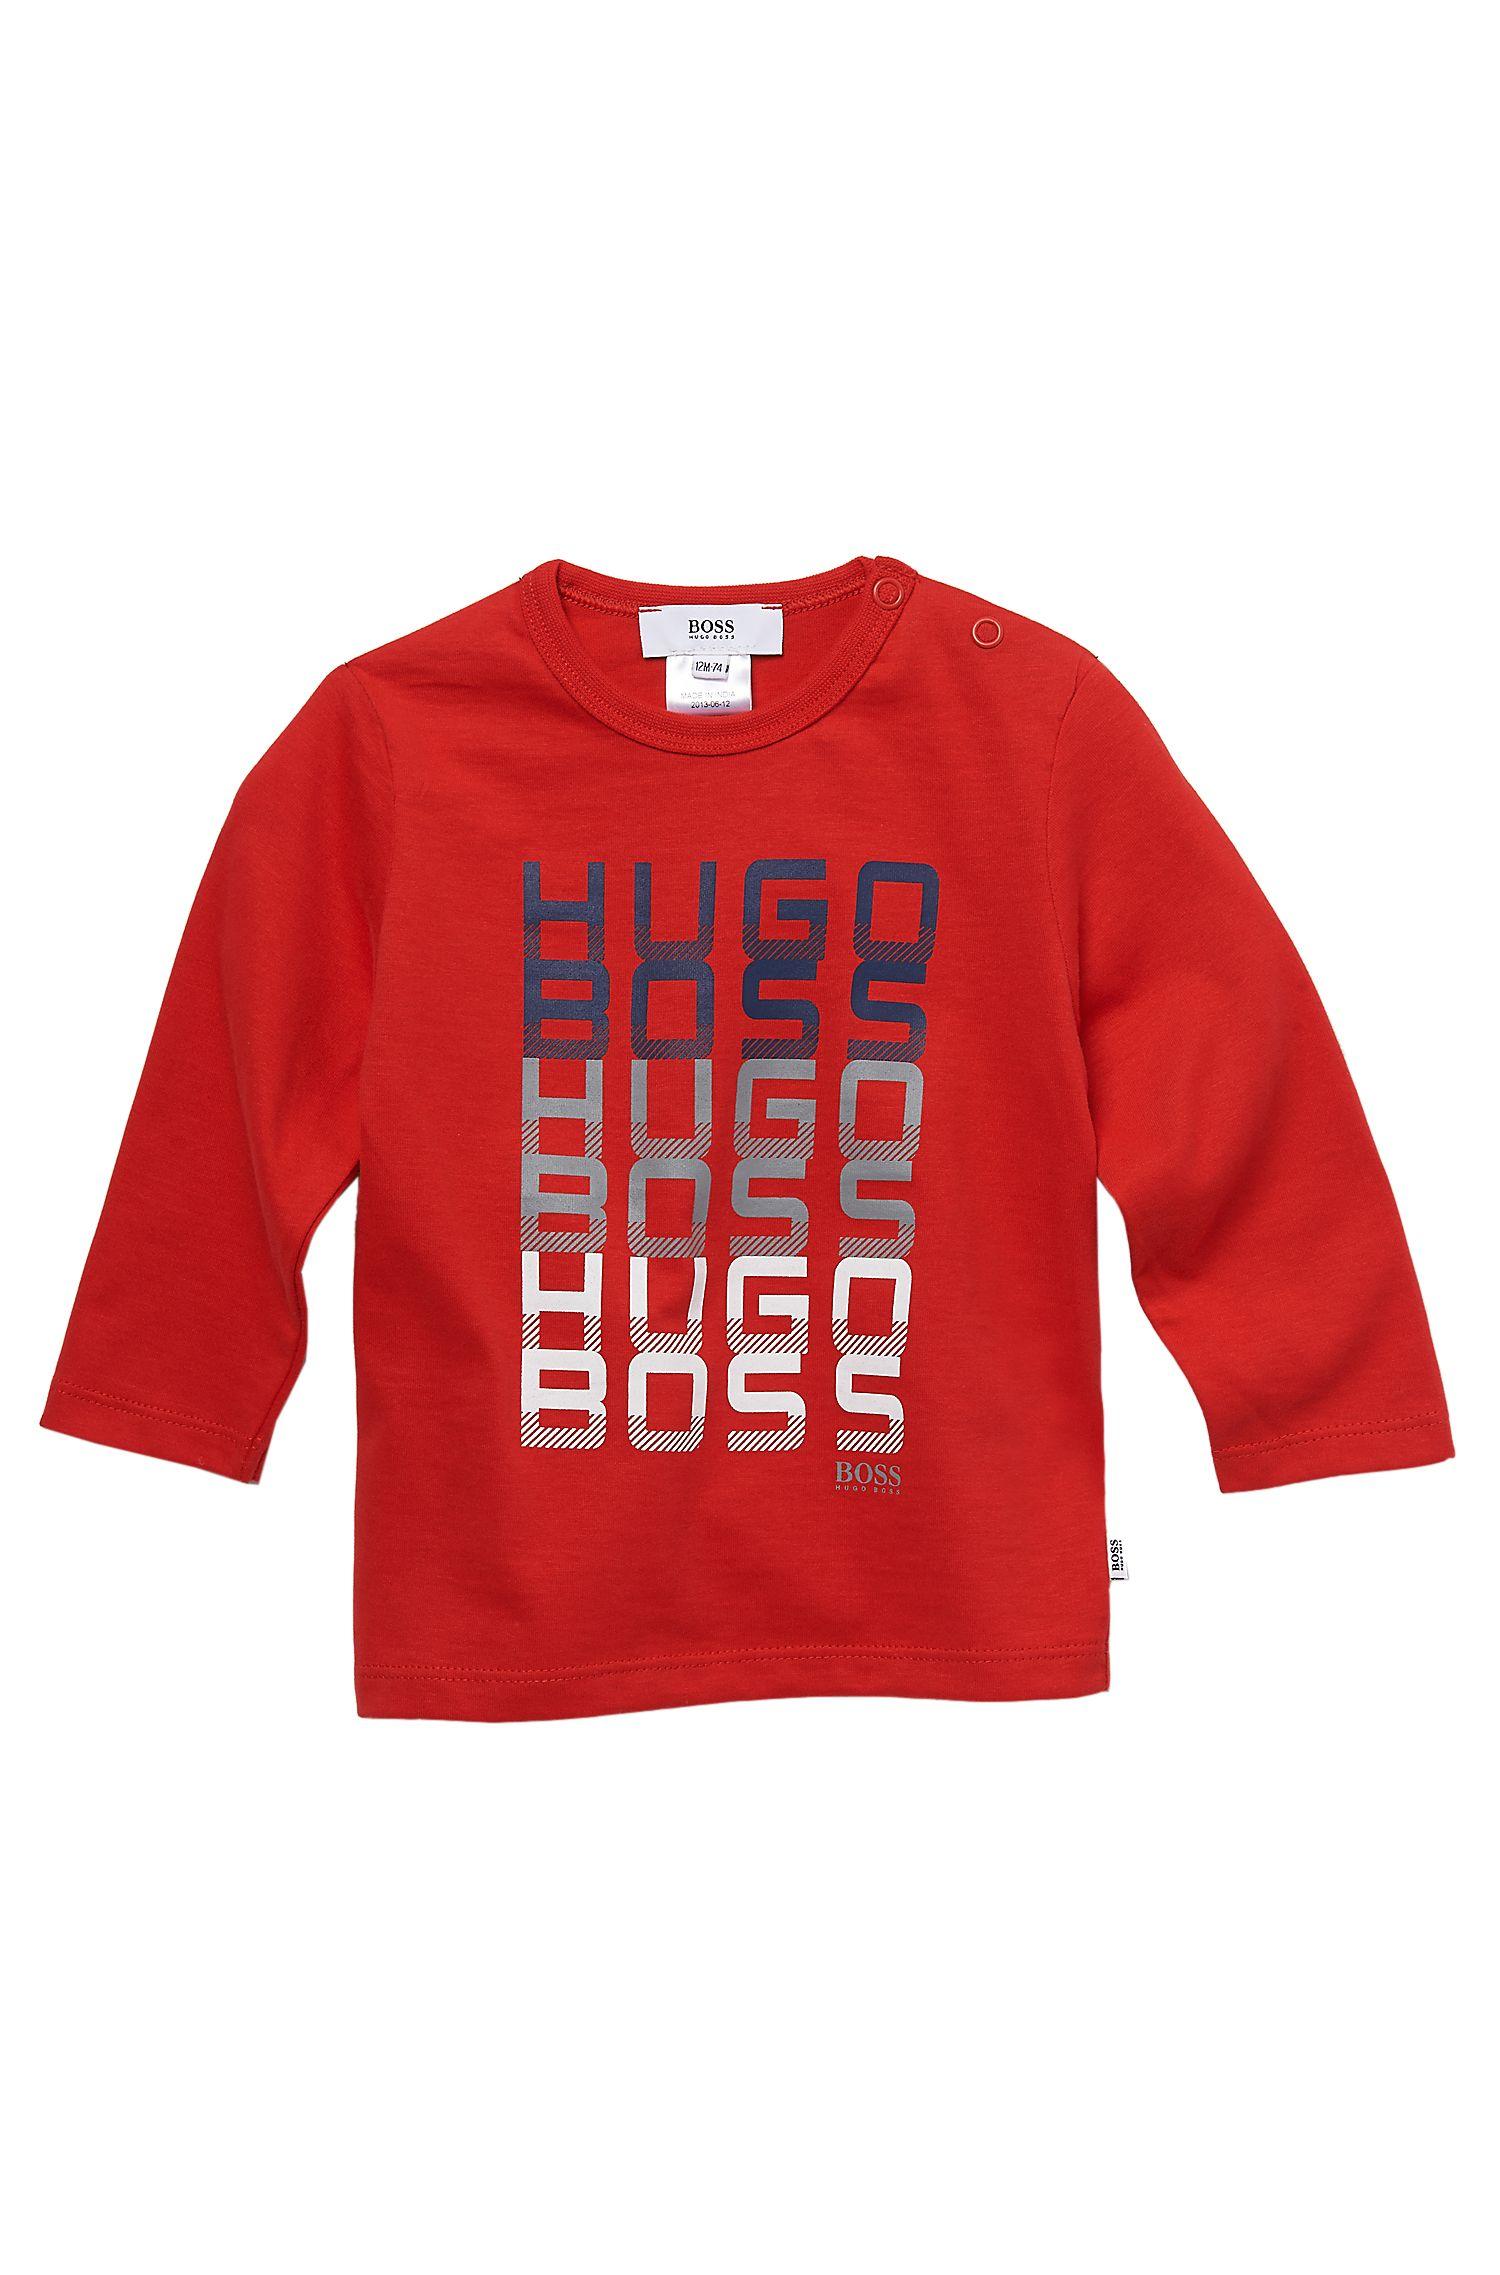 'J05267' | Toddler Long-Sleeved Cotton Print Crewneck T-Shirt